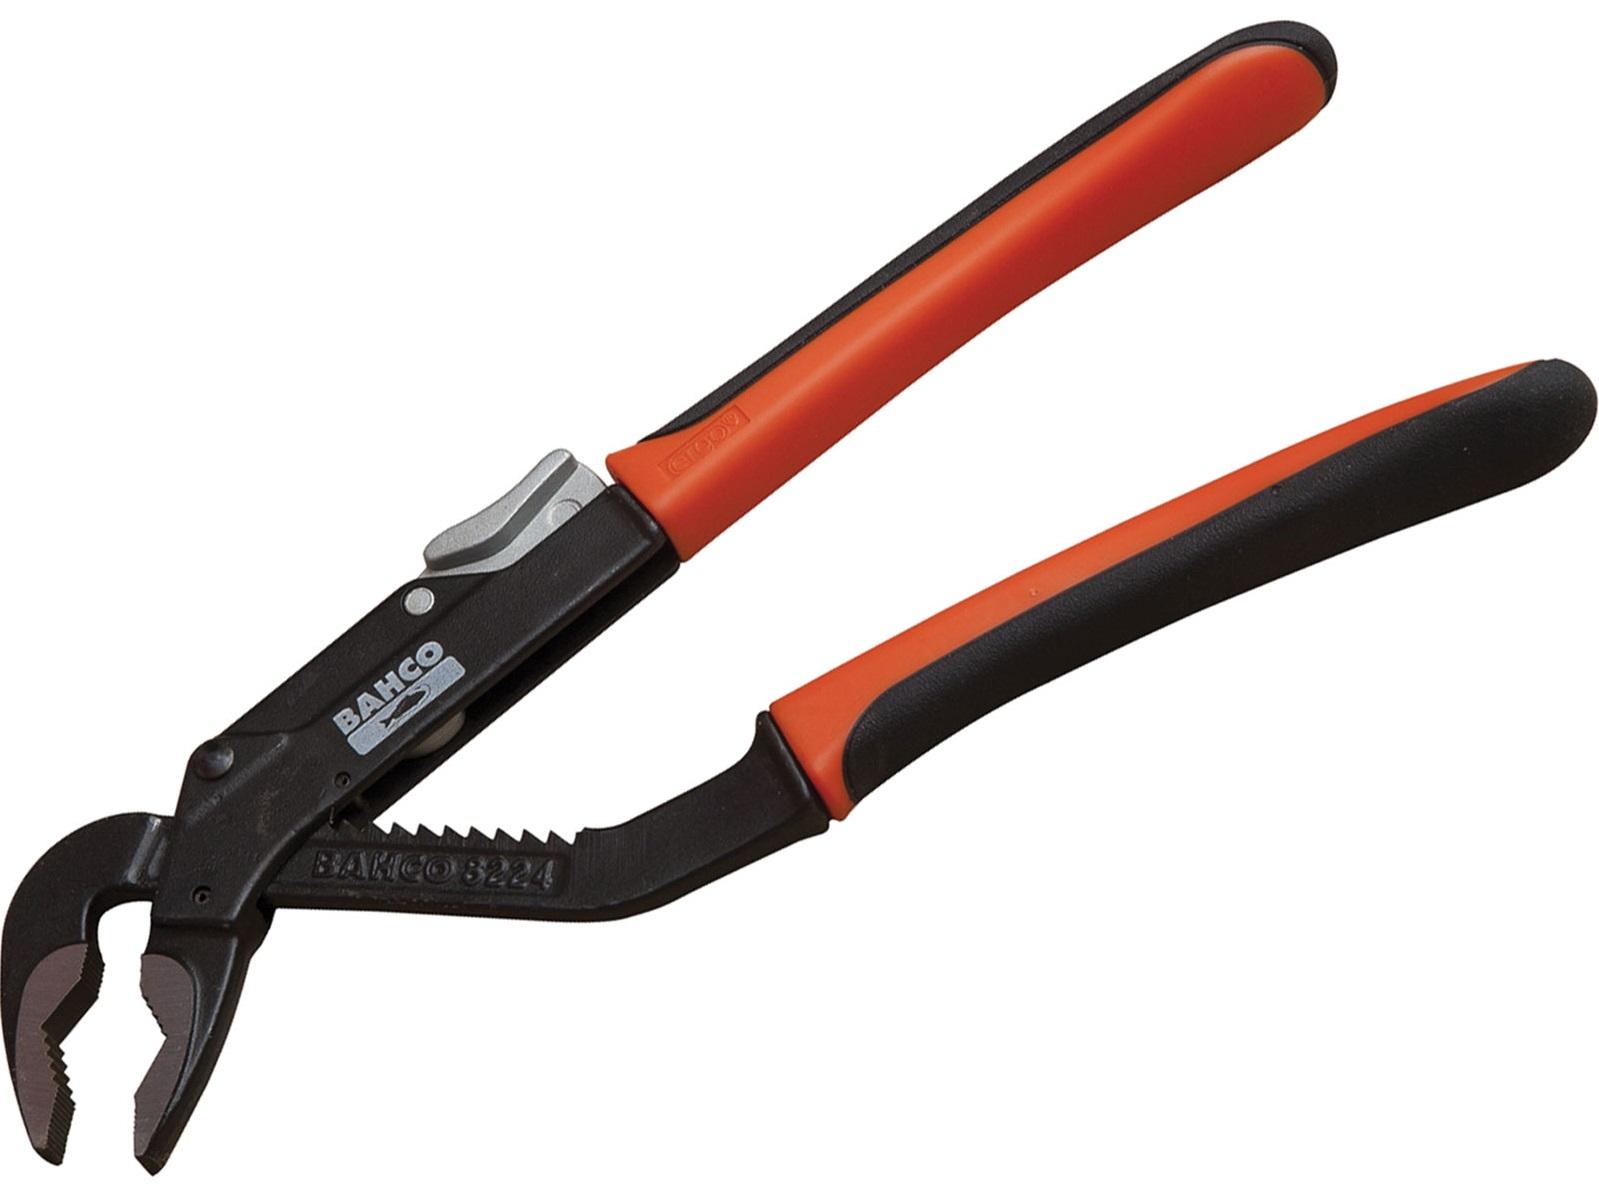 Bahco 8226 400 мм - переставные клещи (Orange/Black)